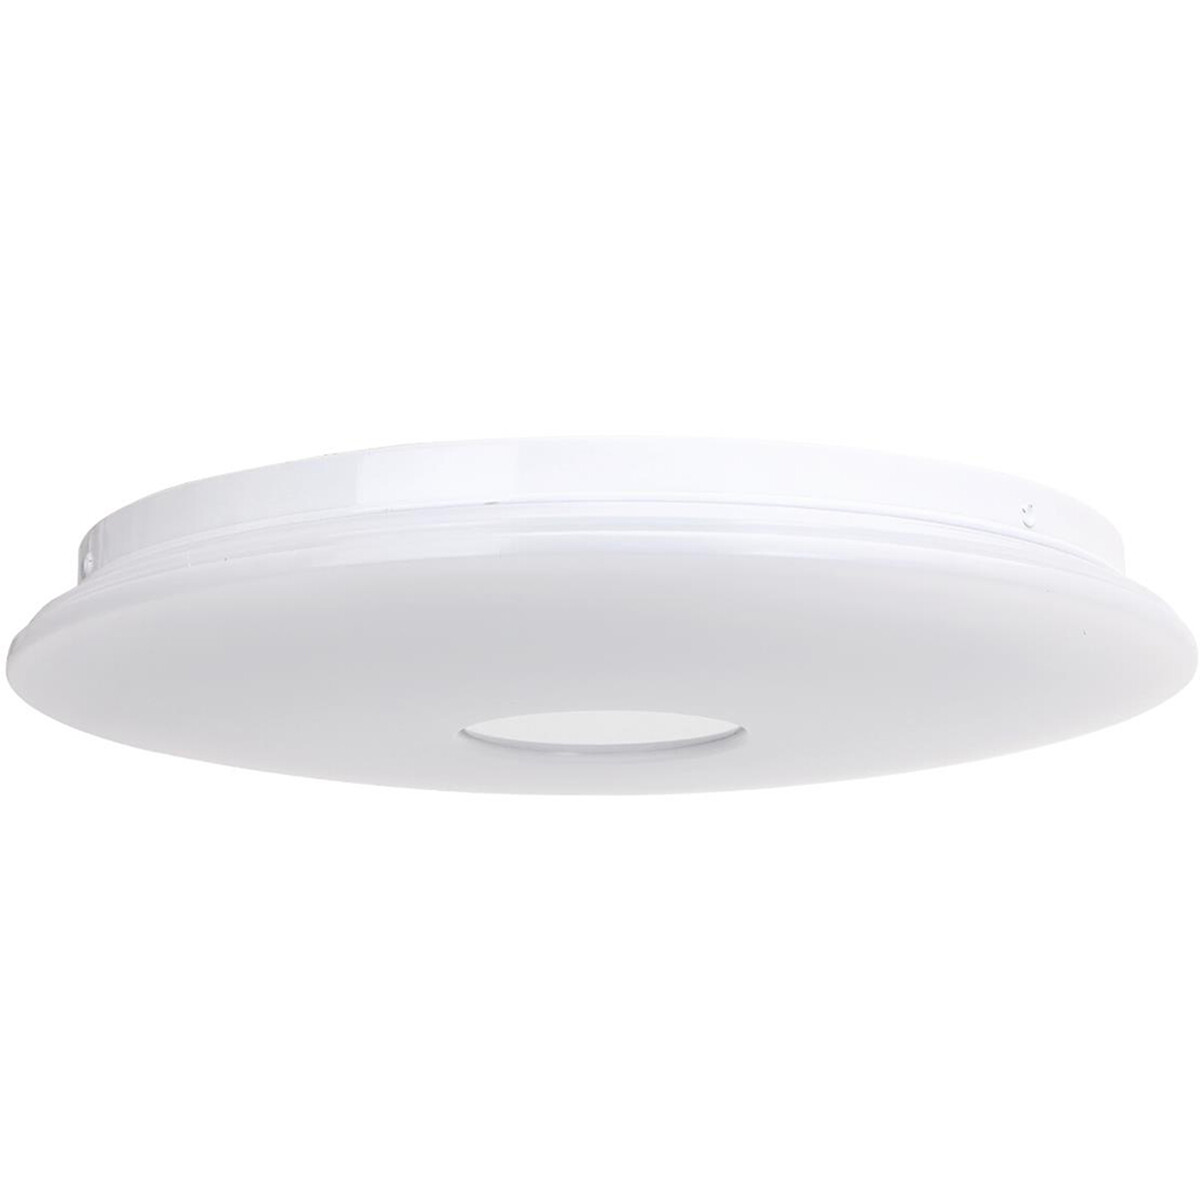 LED Plafondlamp - Smart LED - Trion Ikano - 18W - Aanpasbare Kleur - Rond - Mat Wit - Aluminium